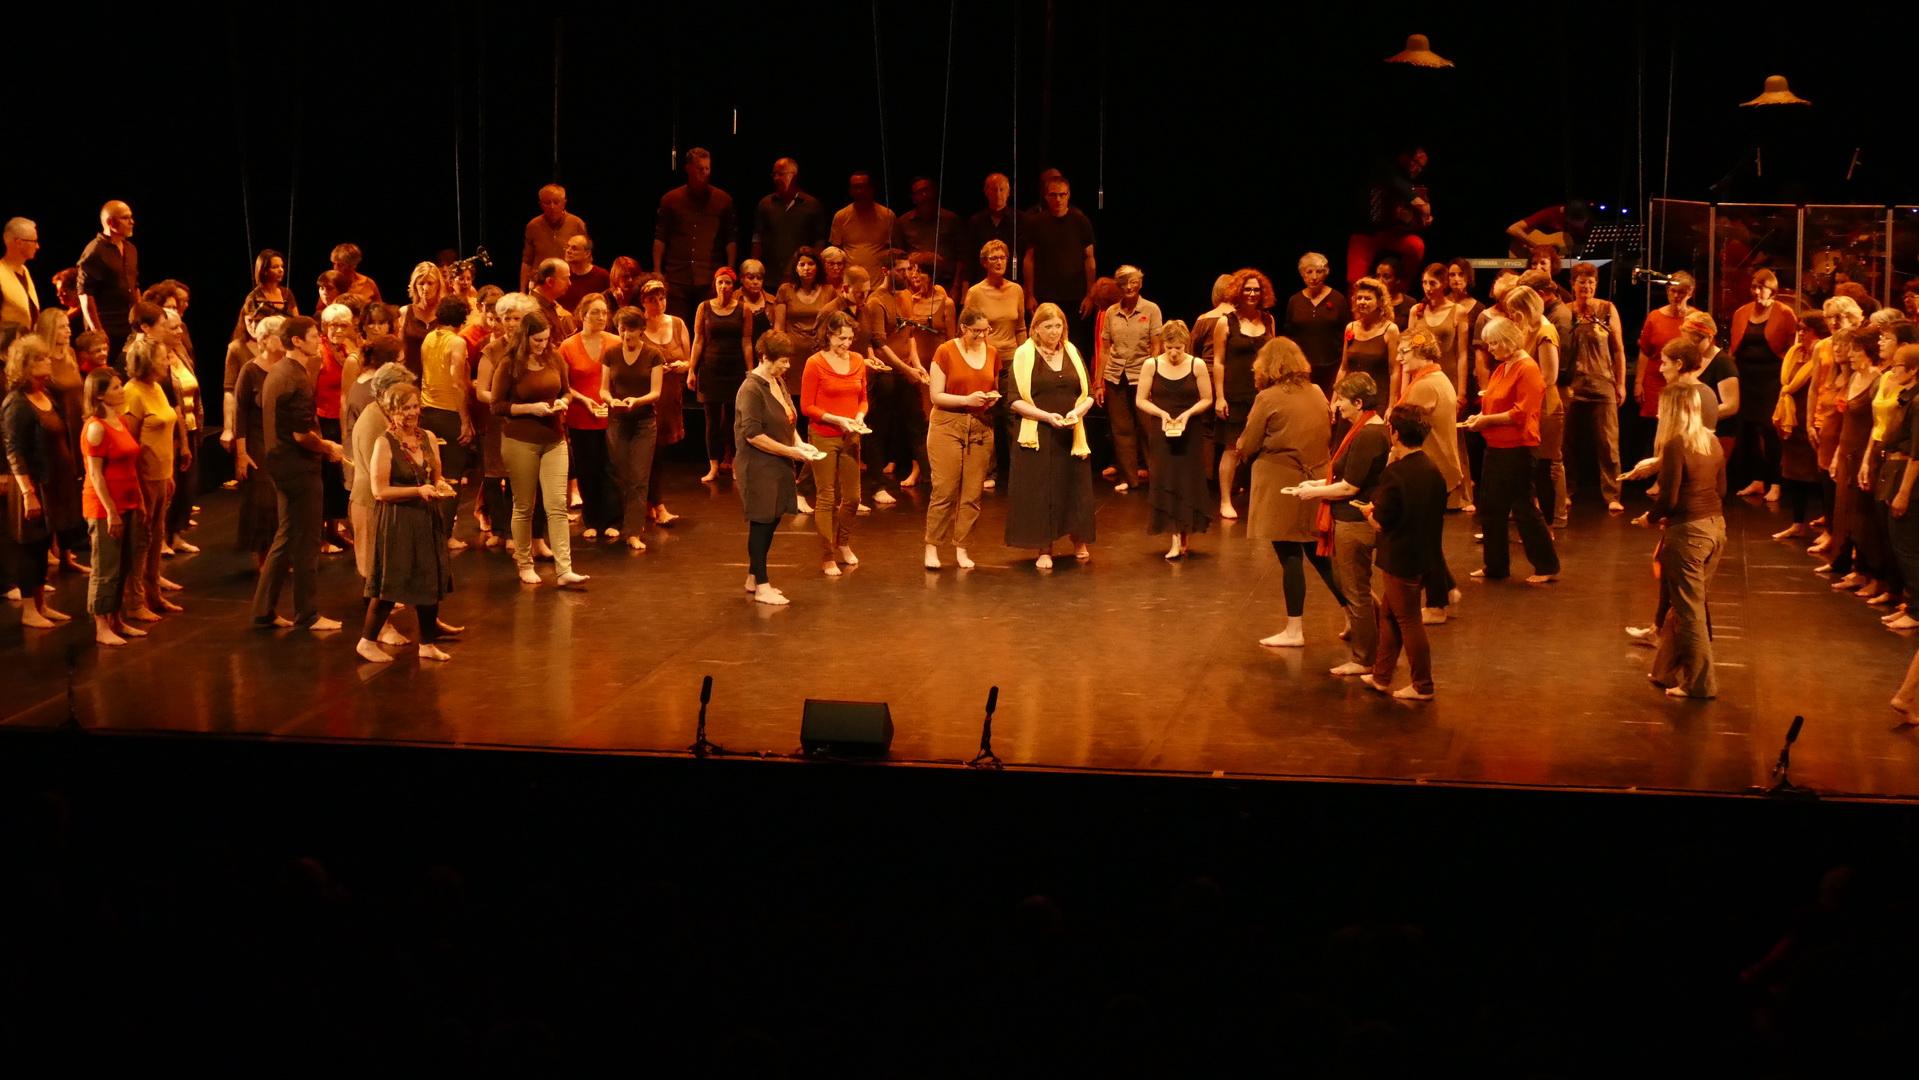 LFDS_concert_ailleurs (71)